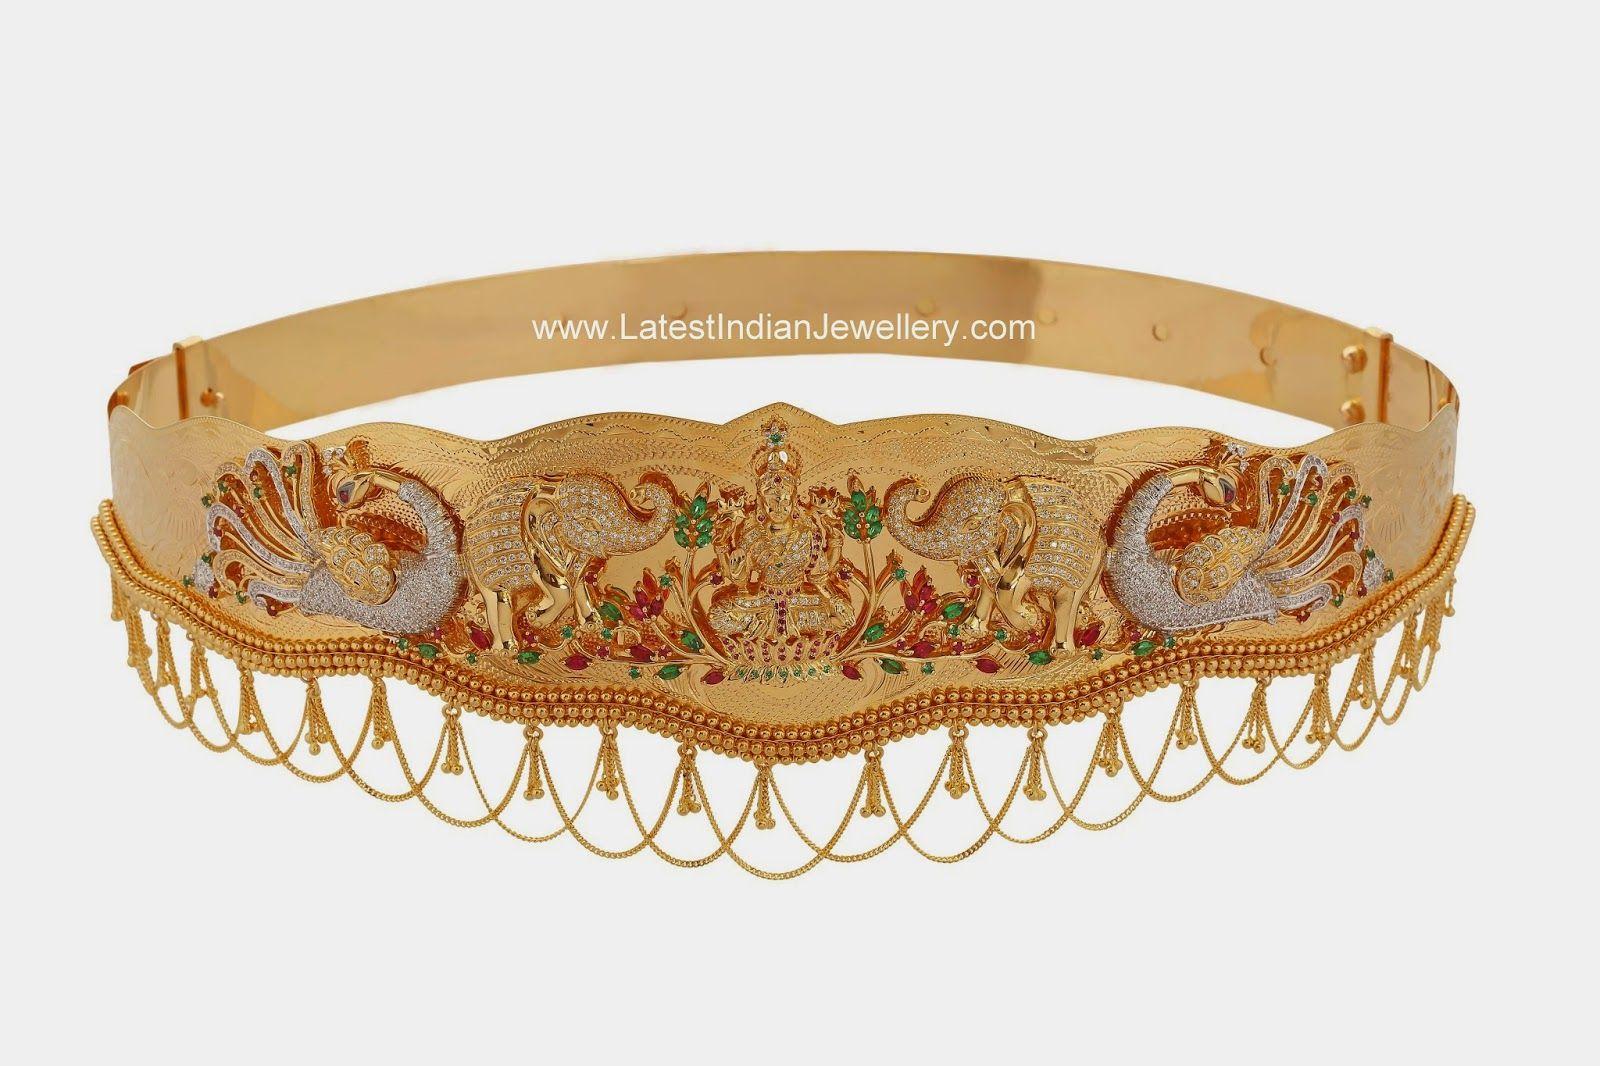 Swarovski Crystals Gold Vaddanam Waist Belts Jewelry